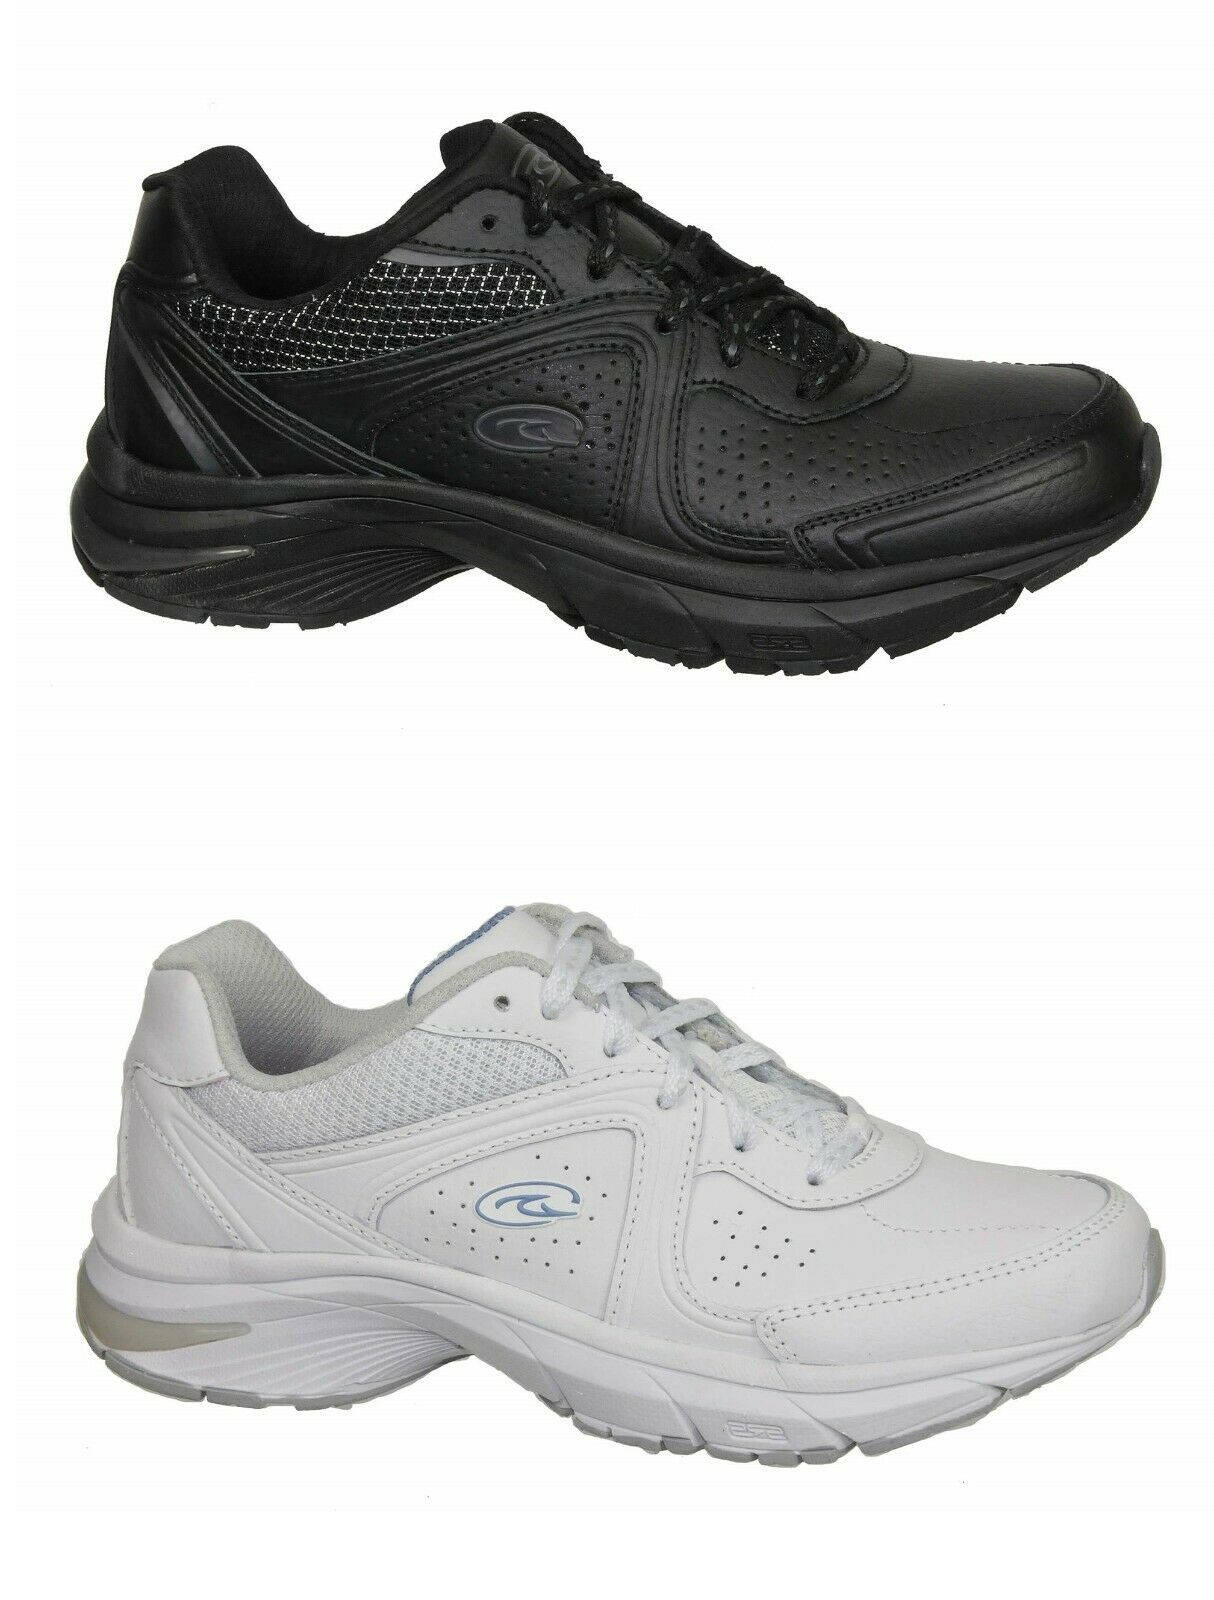 womens wide width white sneakers